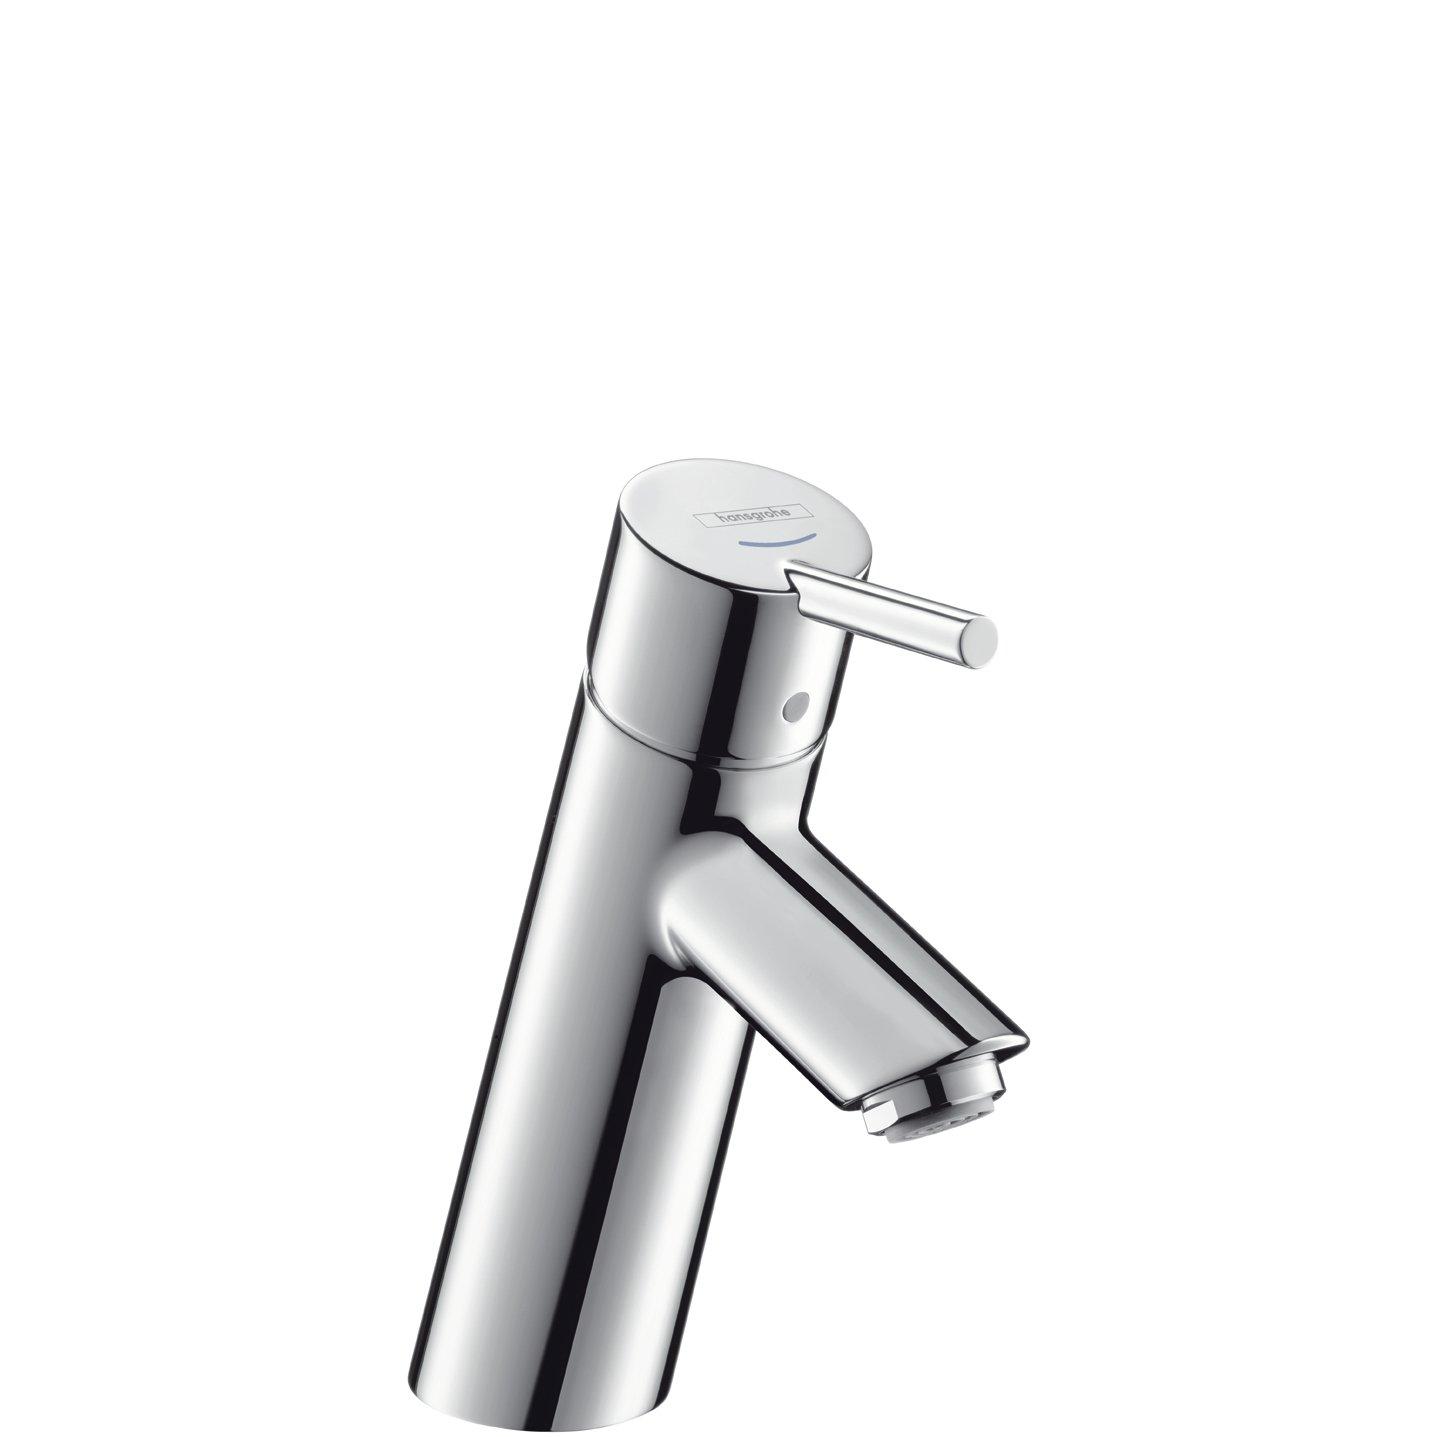 Gut hansgrohe Talis Pillar Tap (single), chrome 32130000: Amazon.co.uk  VS67